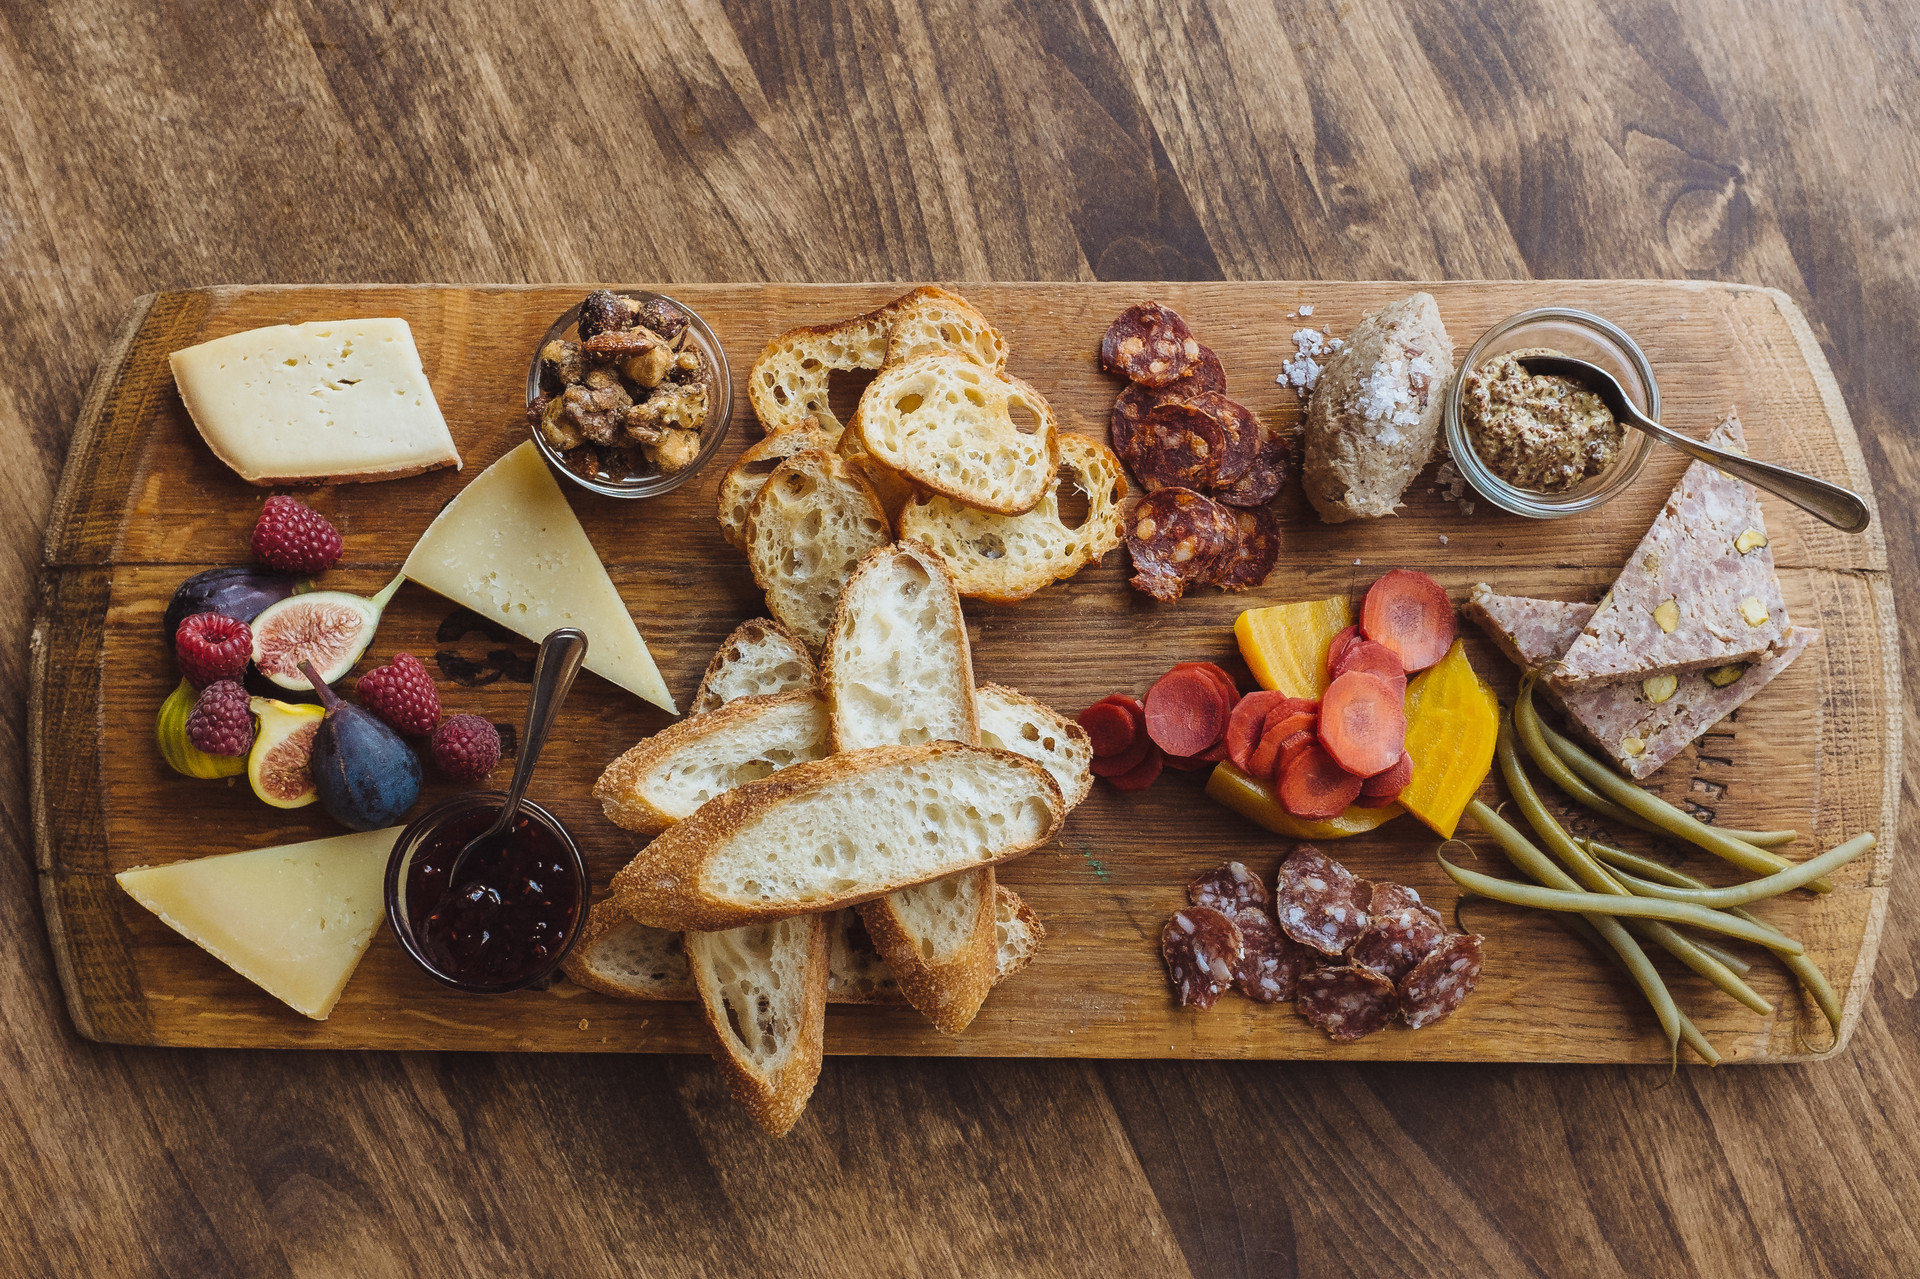 appetizer charcuterie Dining Eat food Food + Drink gourmet Health + Wellness Travel Tips floor meal wooden produce breakfast baking flavor wood sliced